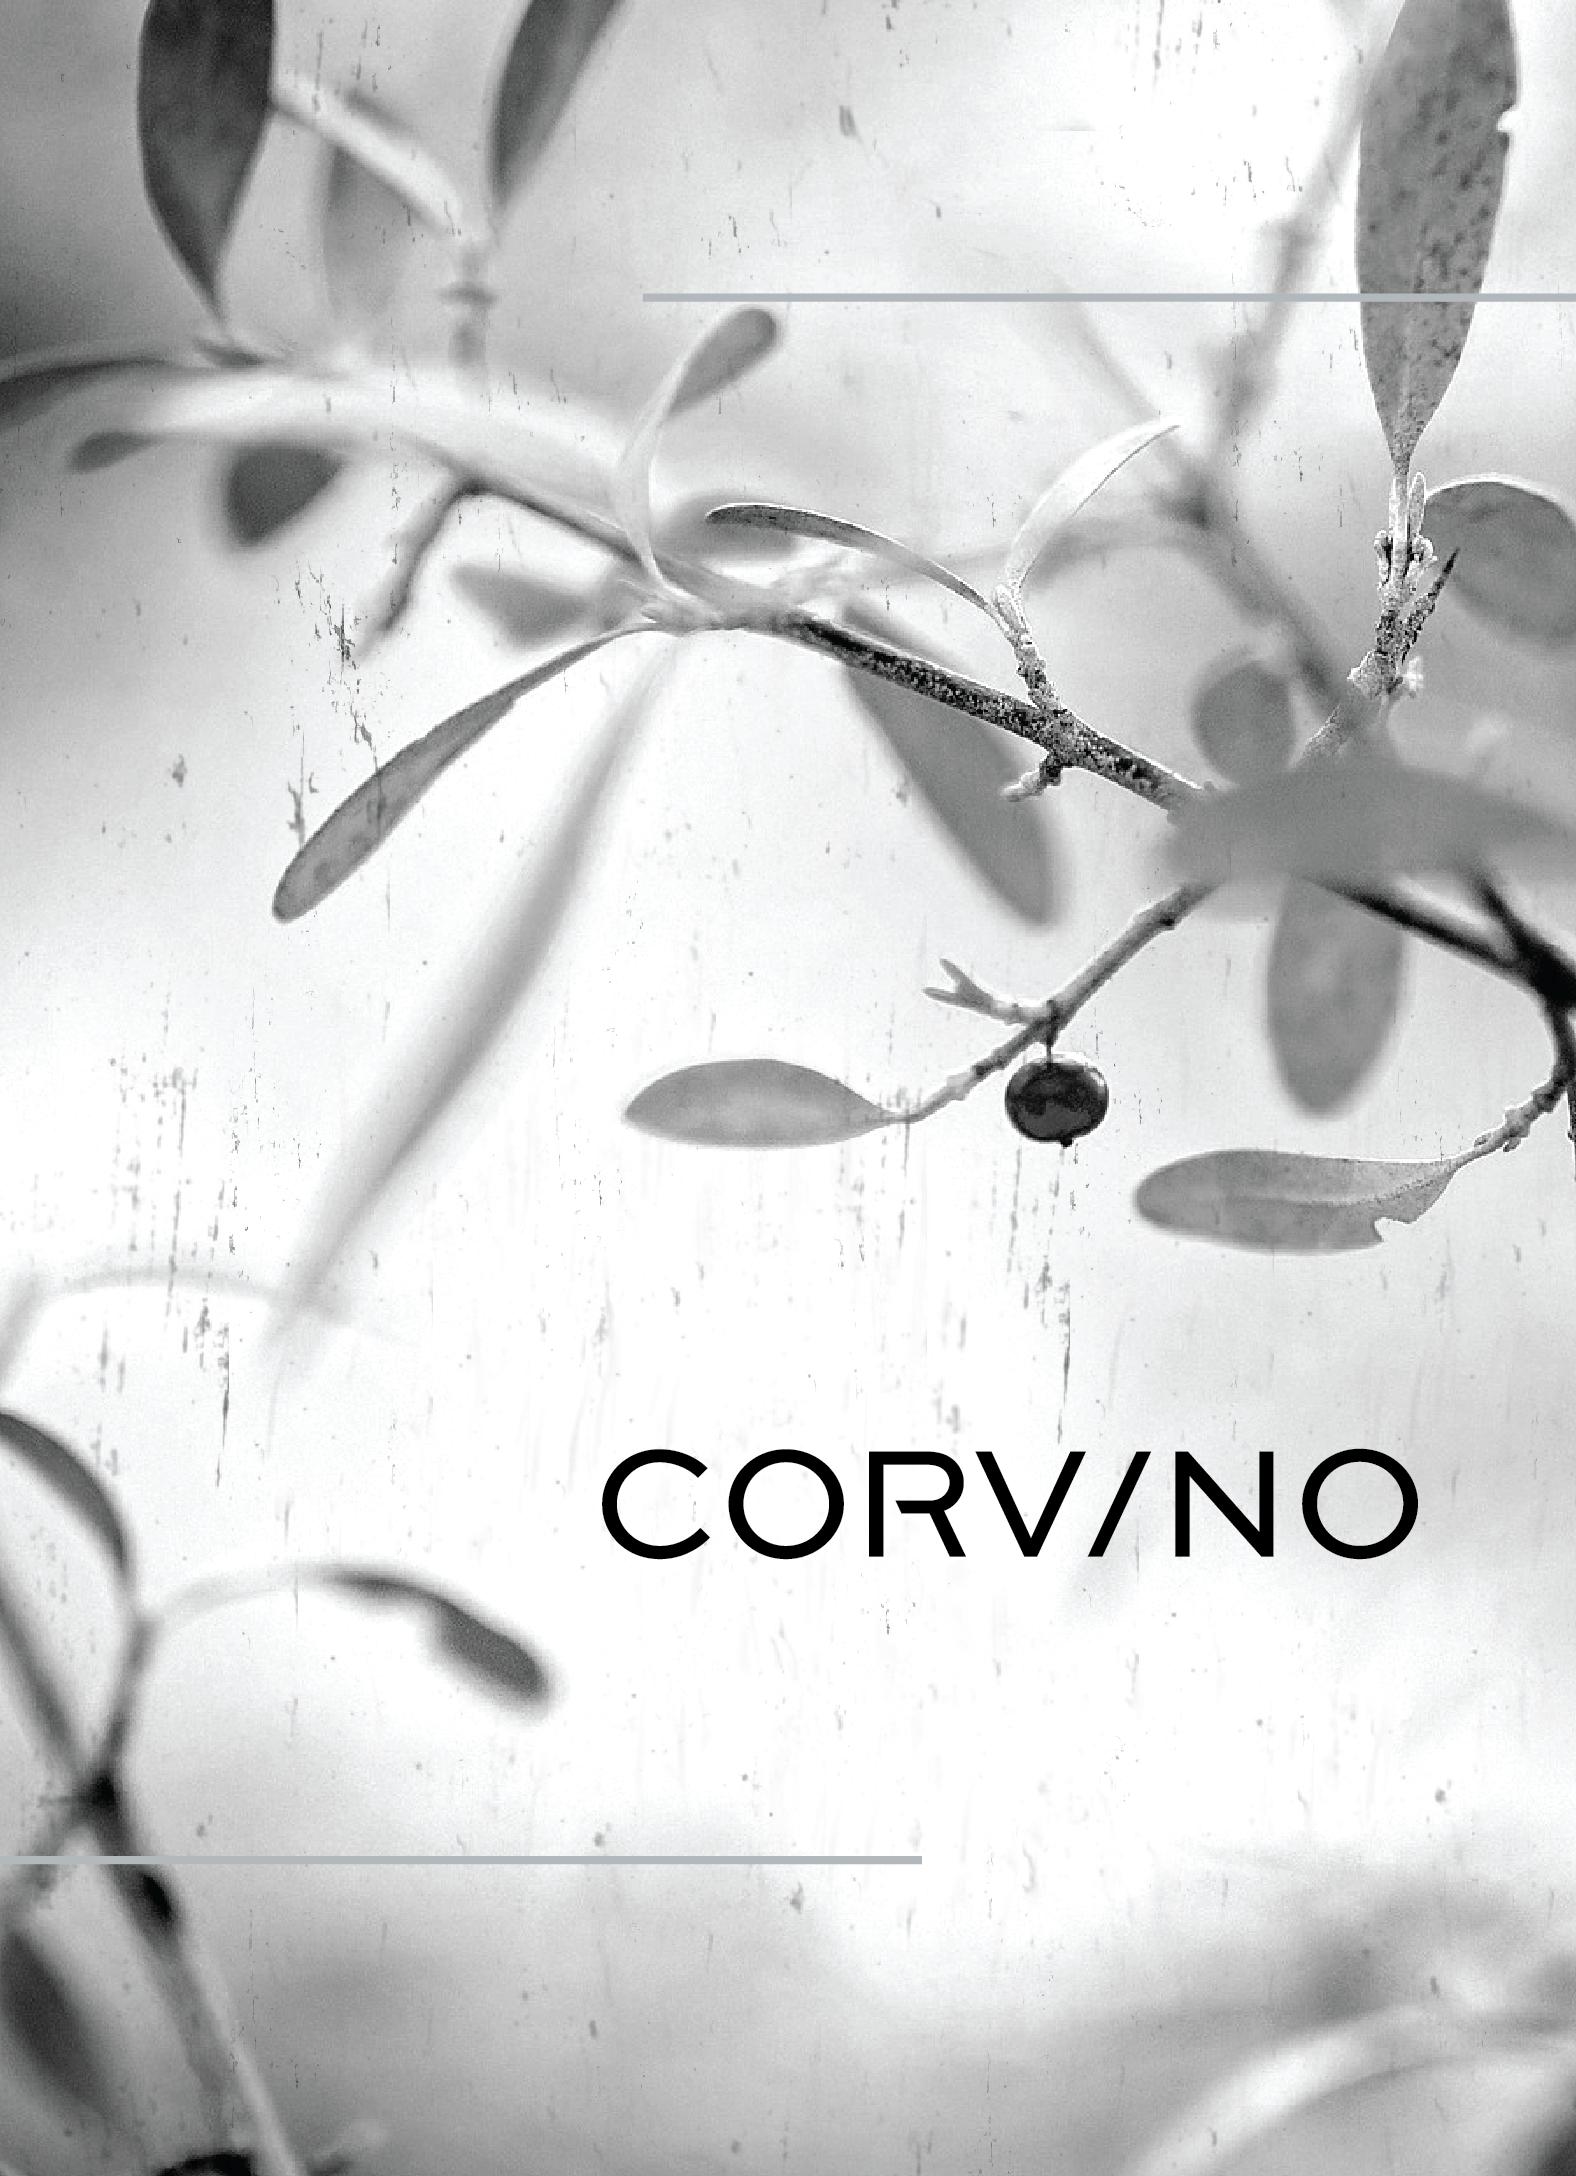 Corvino Check Presnter